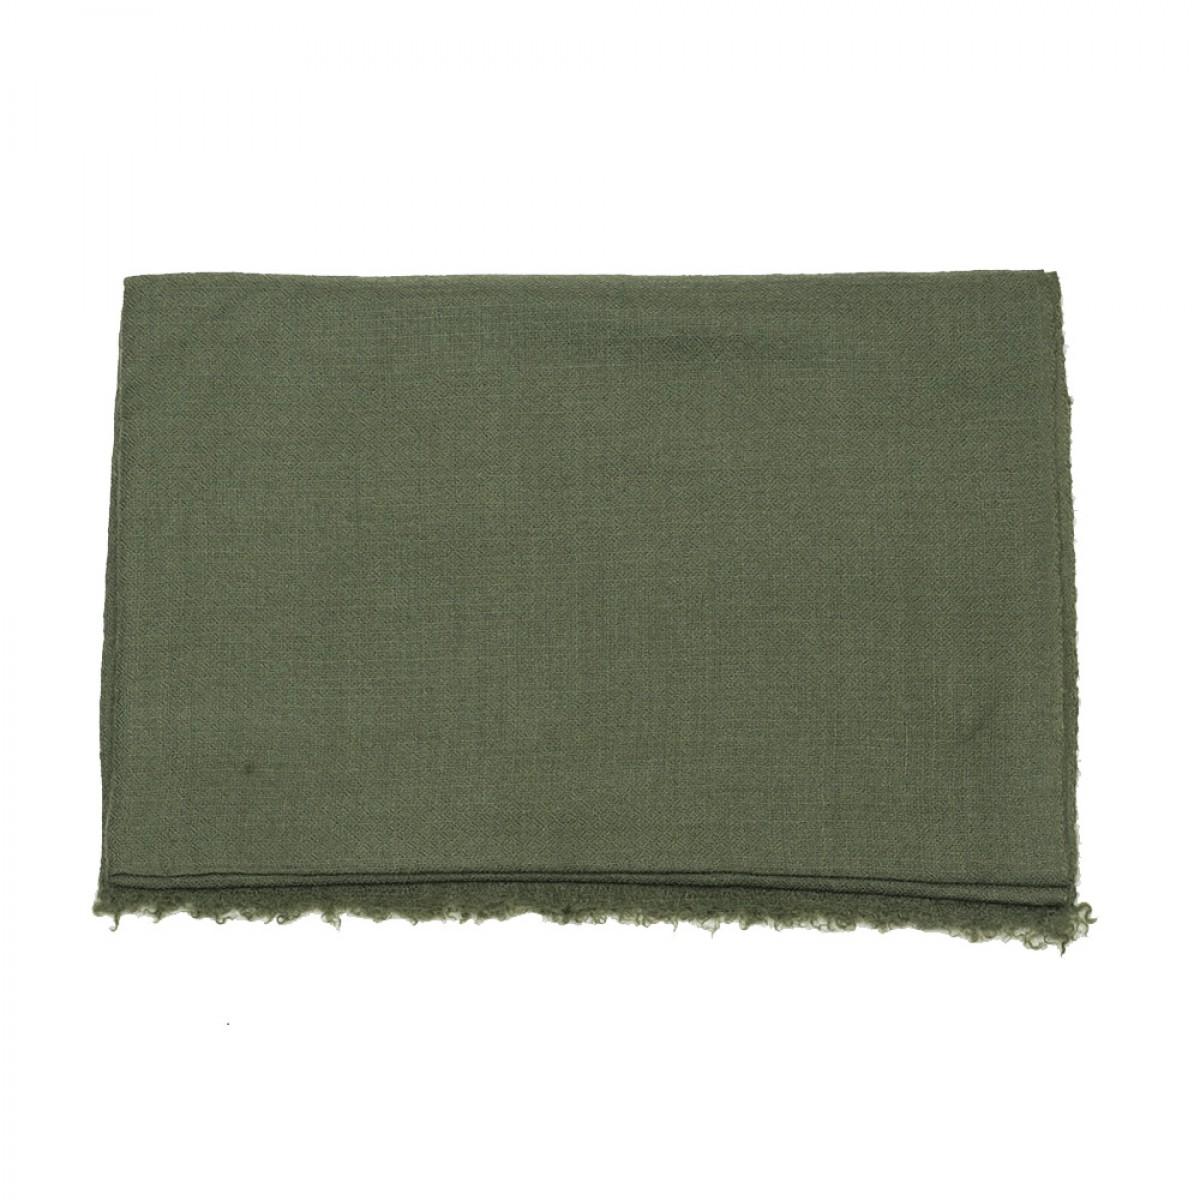 Plain Pashmina Stole - Army Green